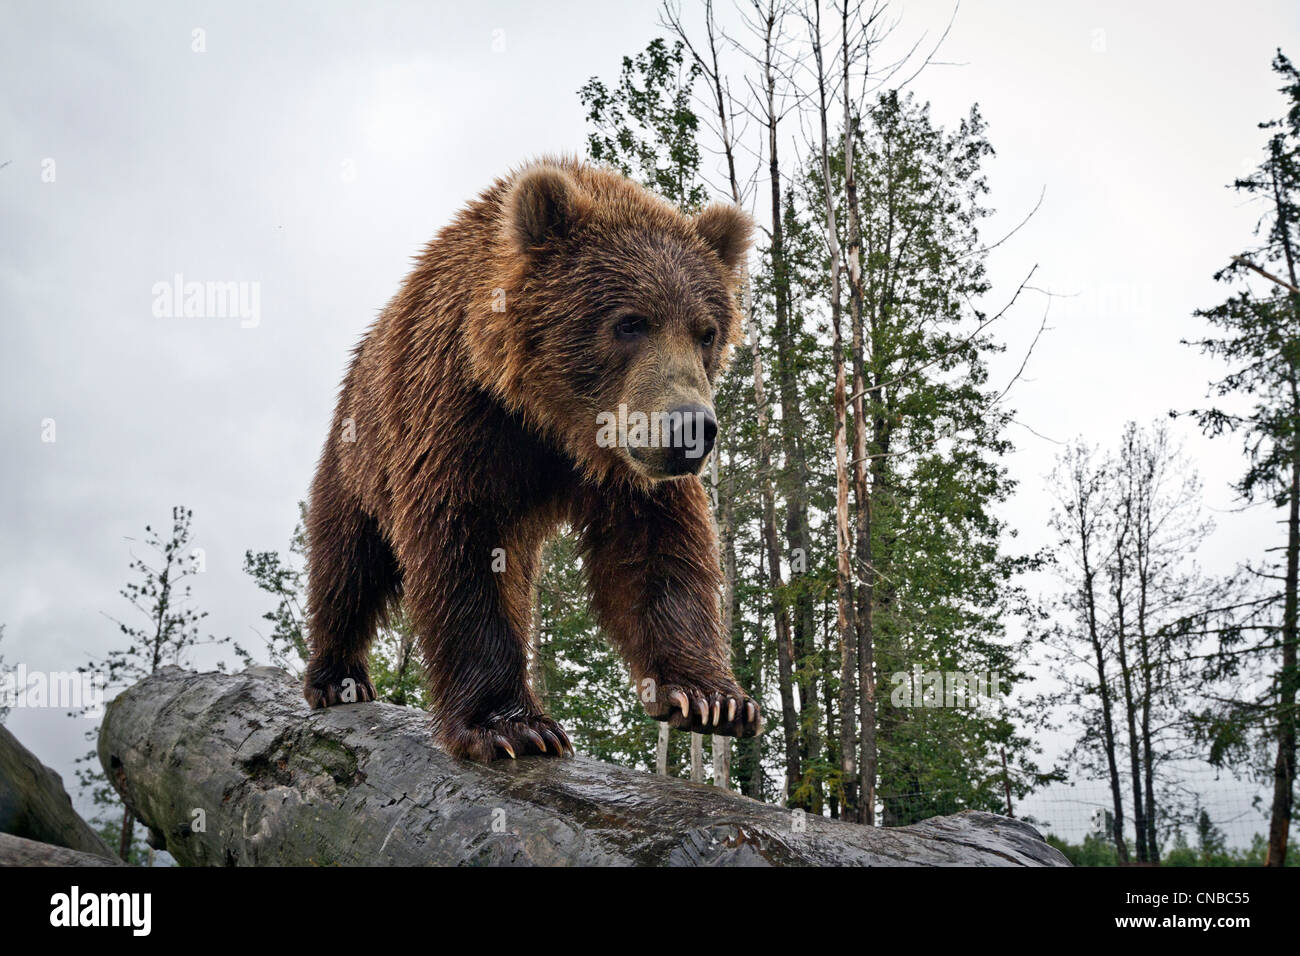 CAPTIVE: Male Kodiak Brown bear walks down a log, Alaska Wildlife Conservation Center, Southcentral Alaska, Summer - Stock Image